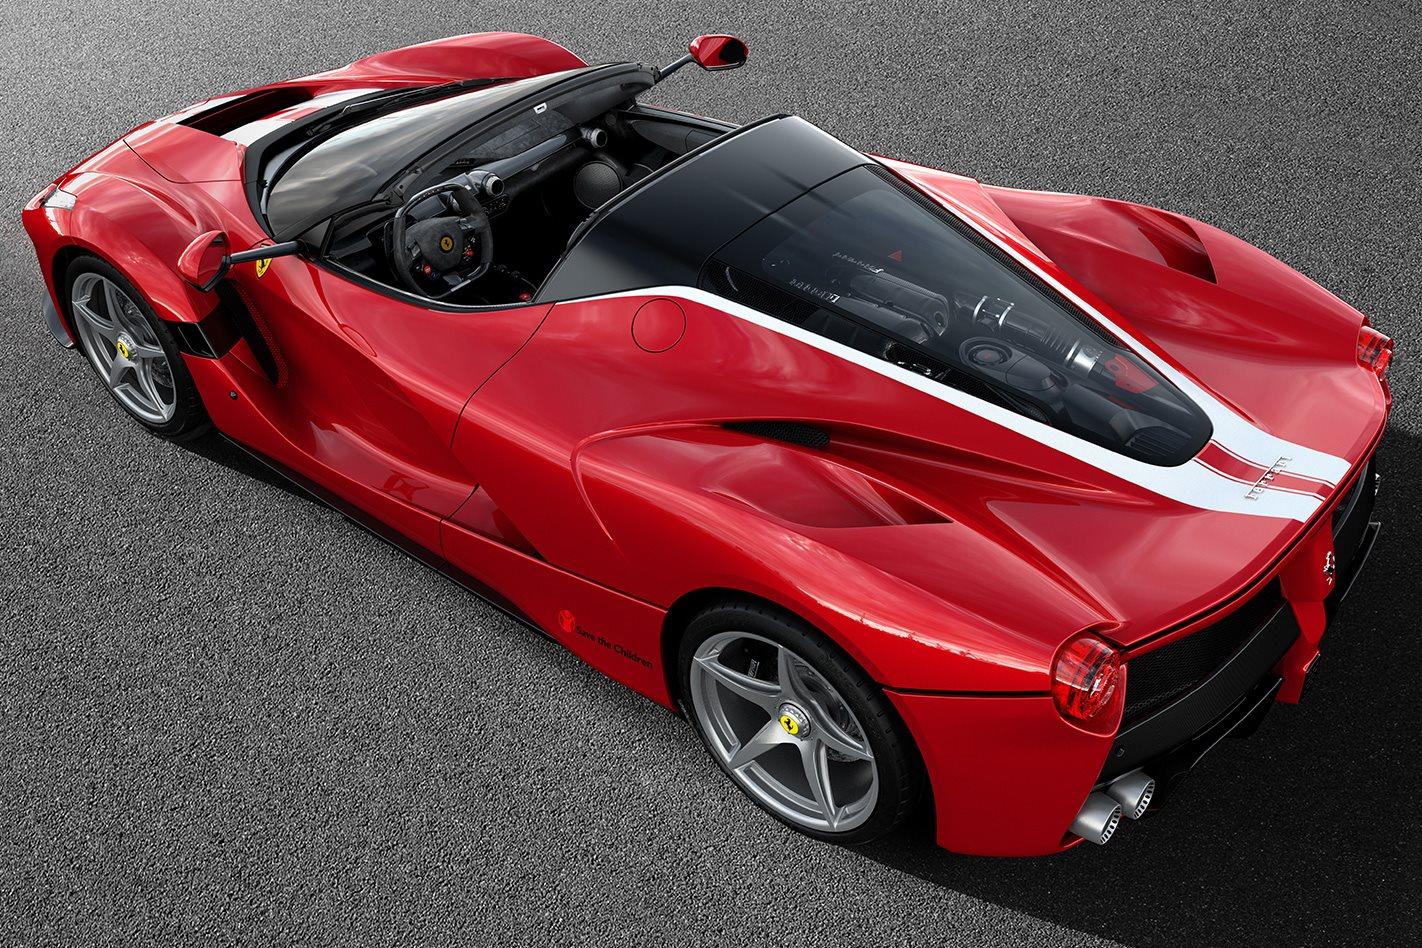 Ferrari LaFerrari Aperta rear